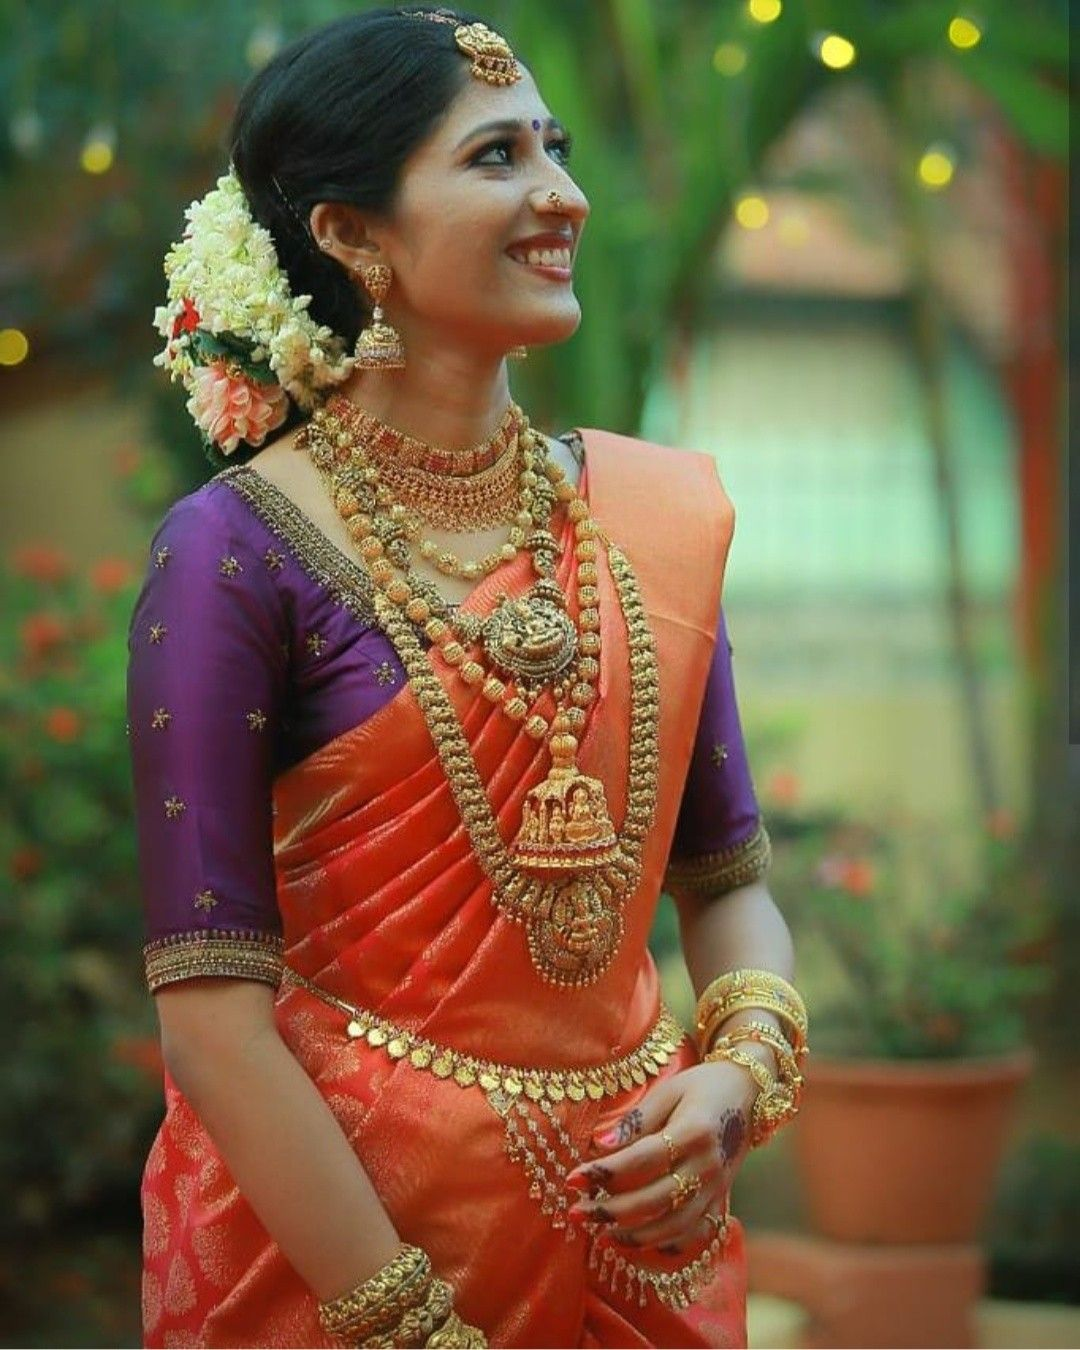 Kerala Bride Hindhu: South Indian Bride. Indian Bridal Temple Jewelry. Jhumkis